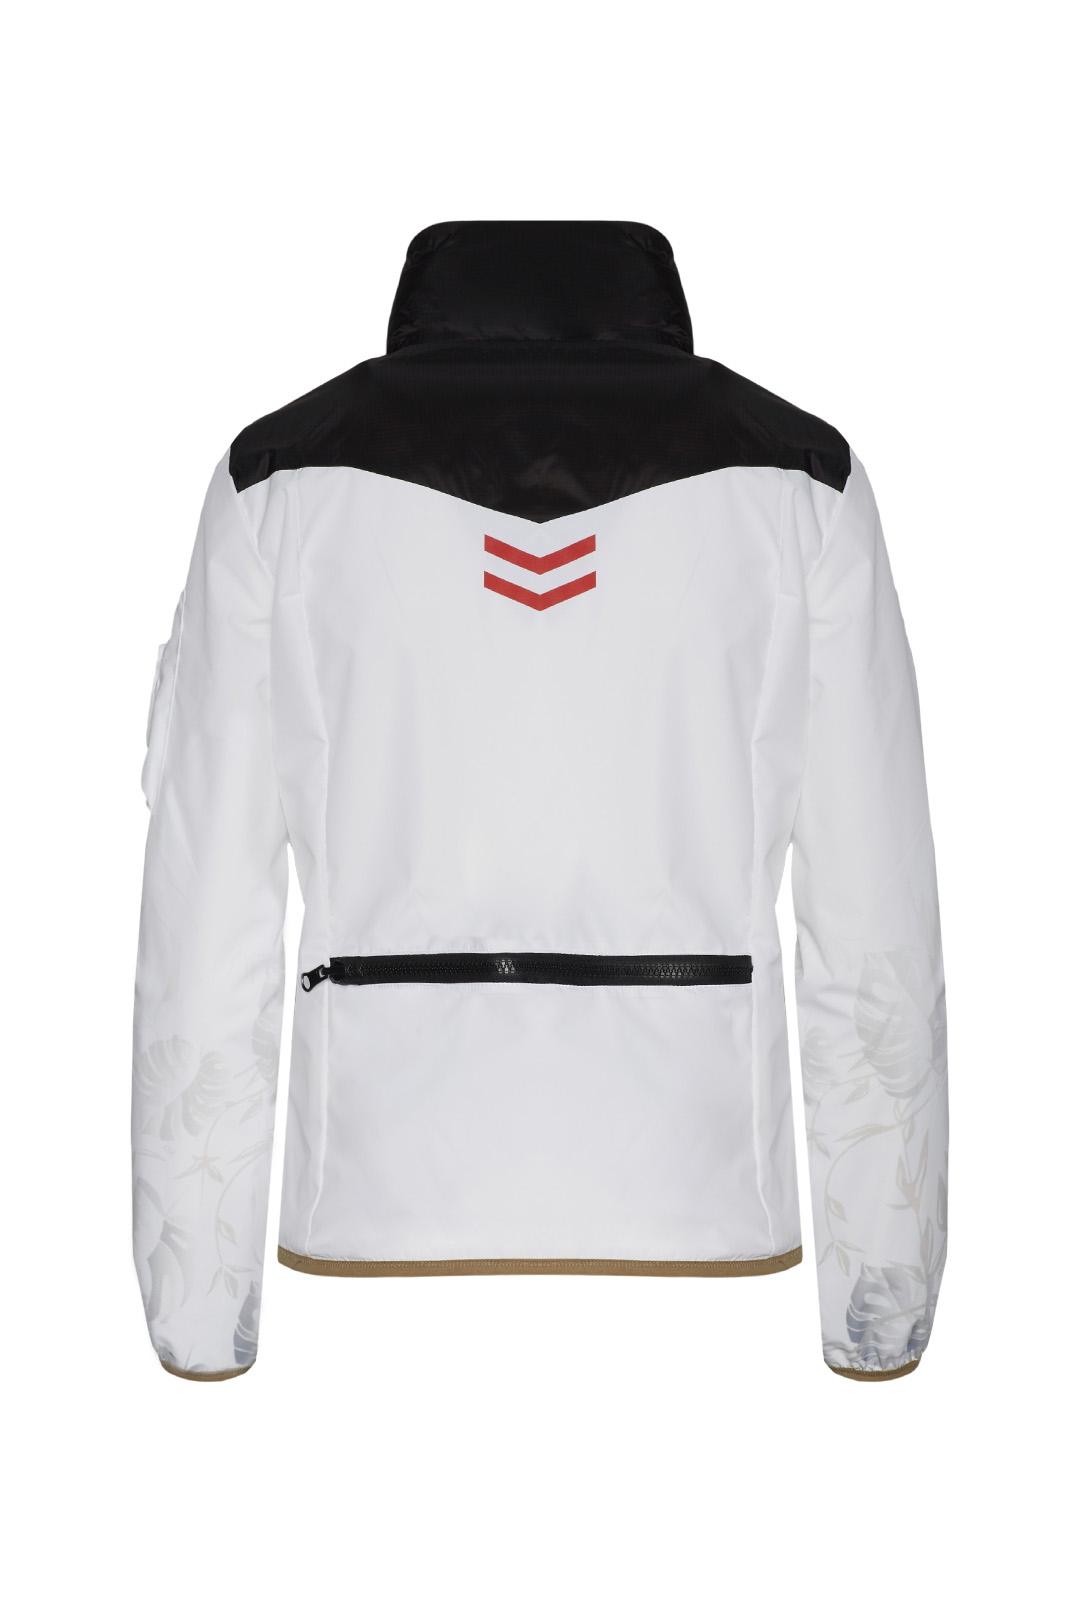 Tropical pattern Jacket                        2